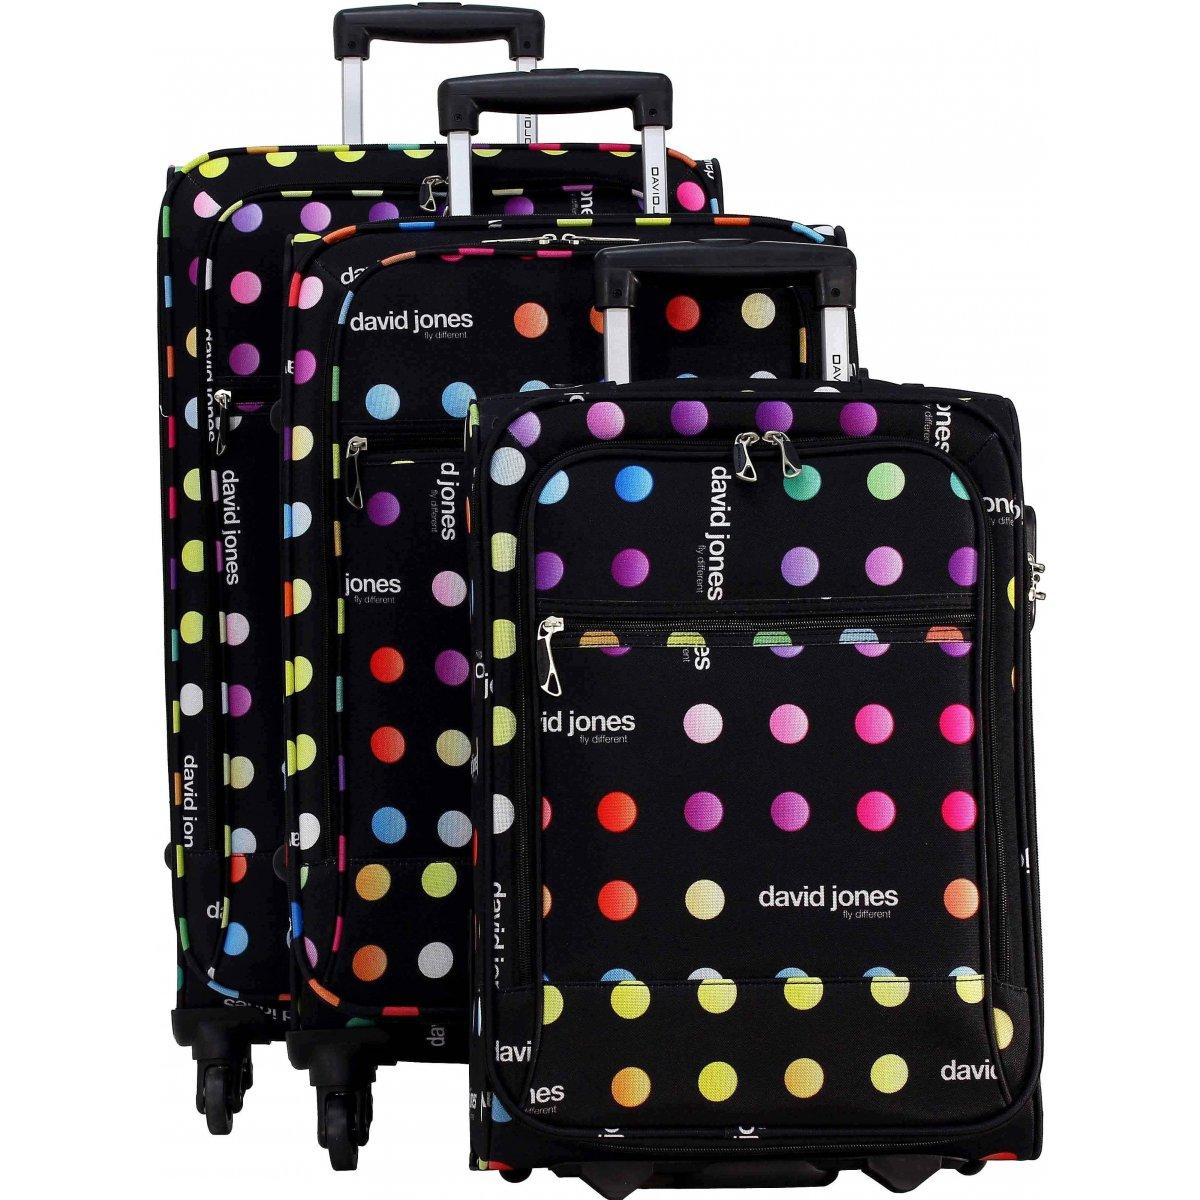 lot 3 valises dont 1 cabine ryanair david jones ba50173 couleur principale little. Black Bedroom Furniture Sets. Home Design Ideas